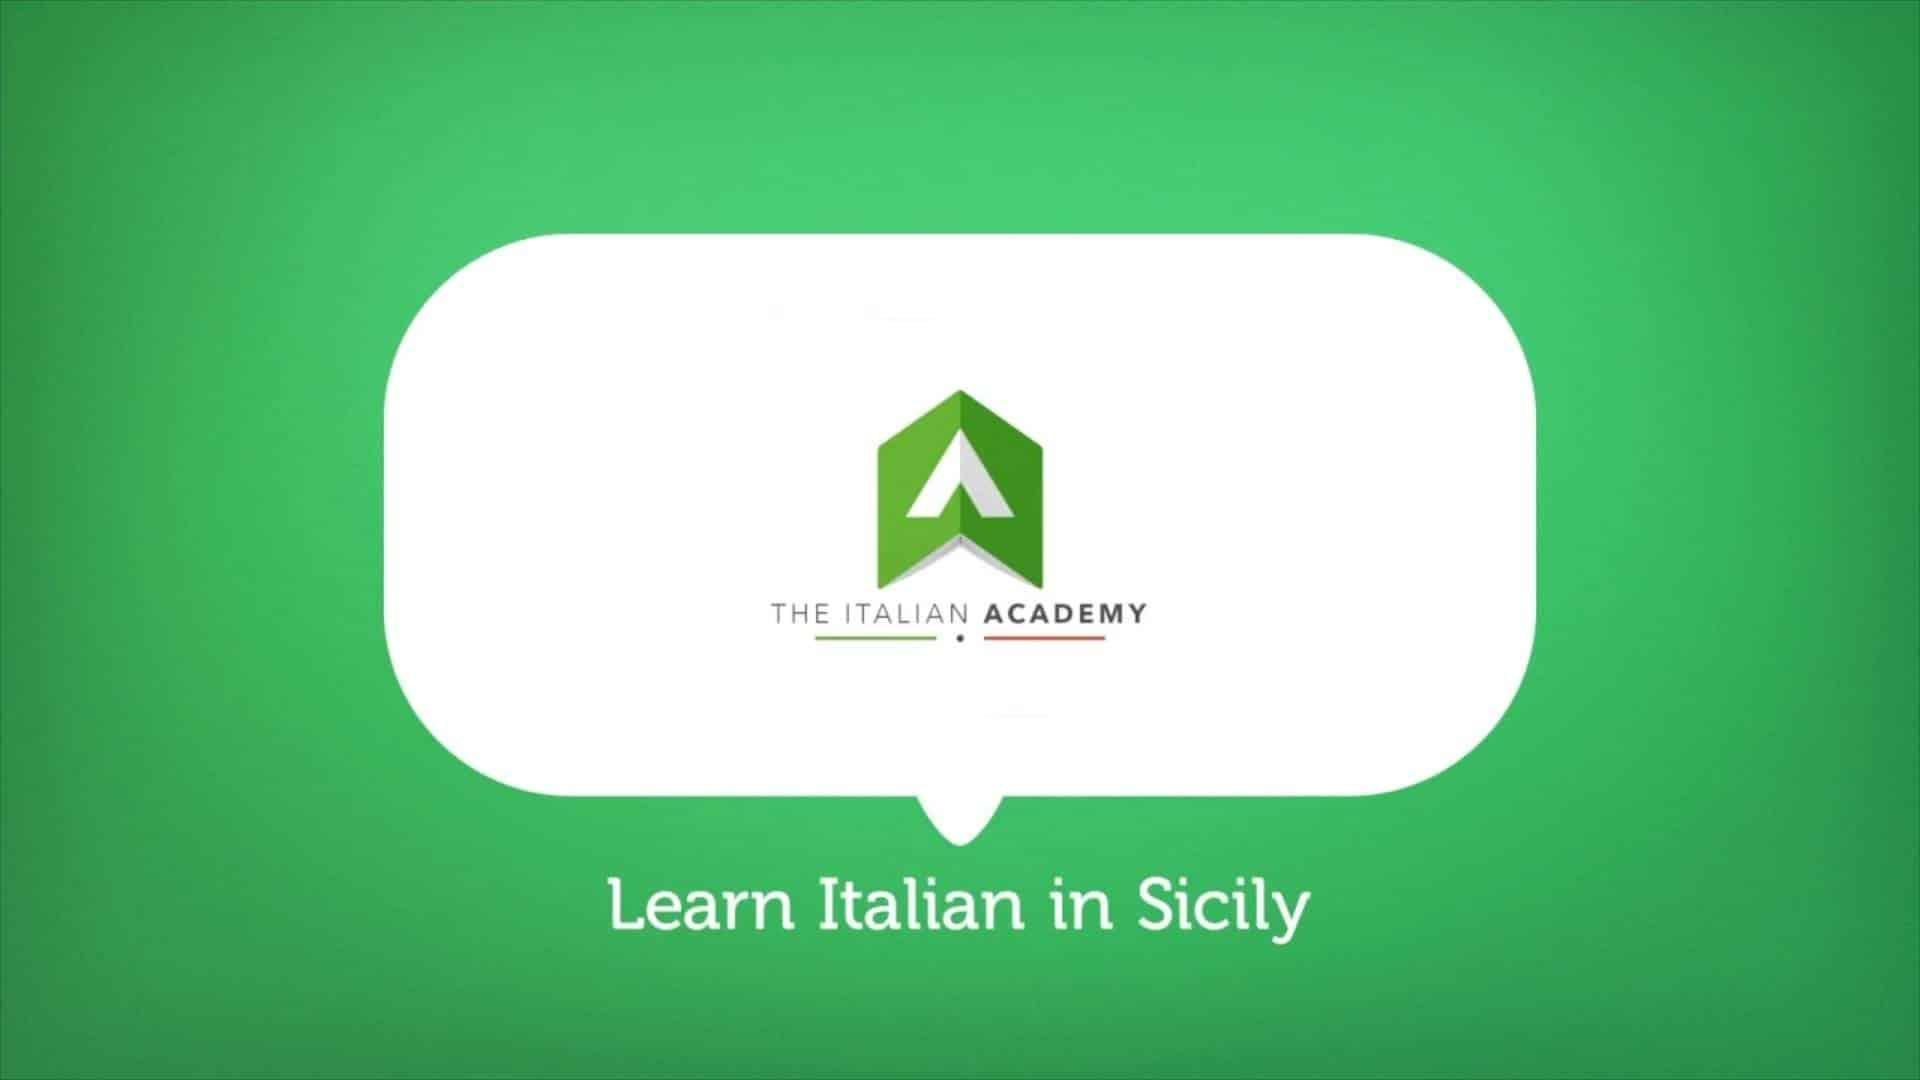 Cours d'italien : The Italian Academy